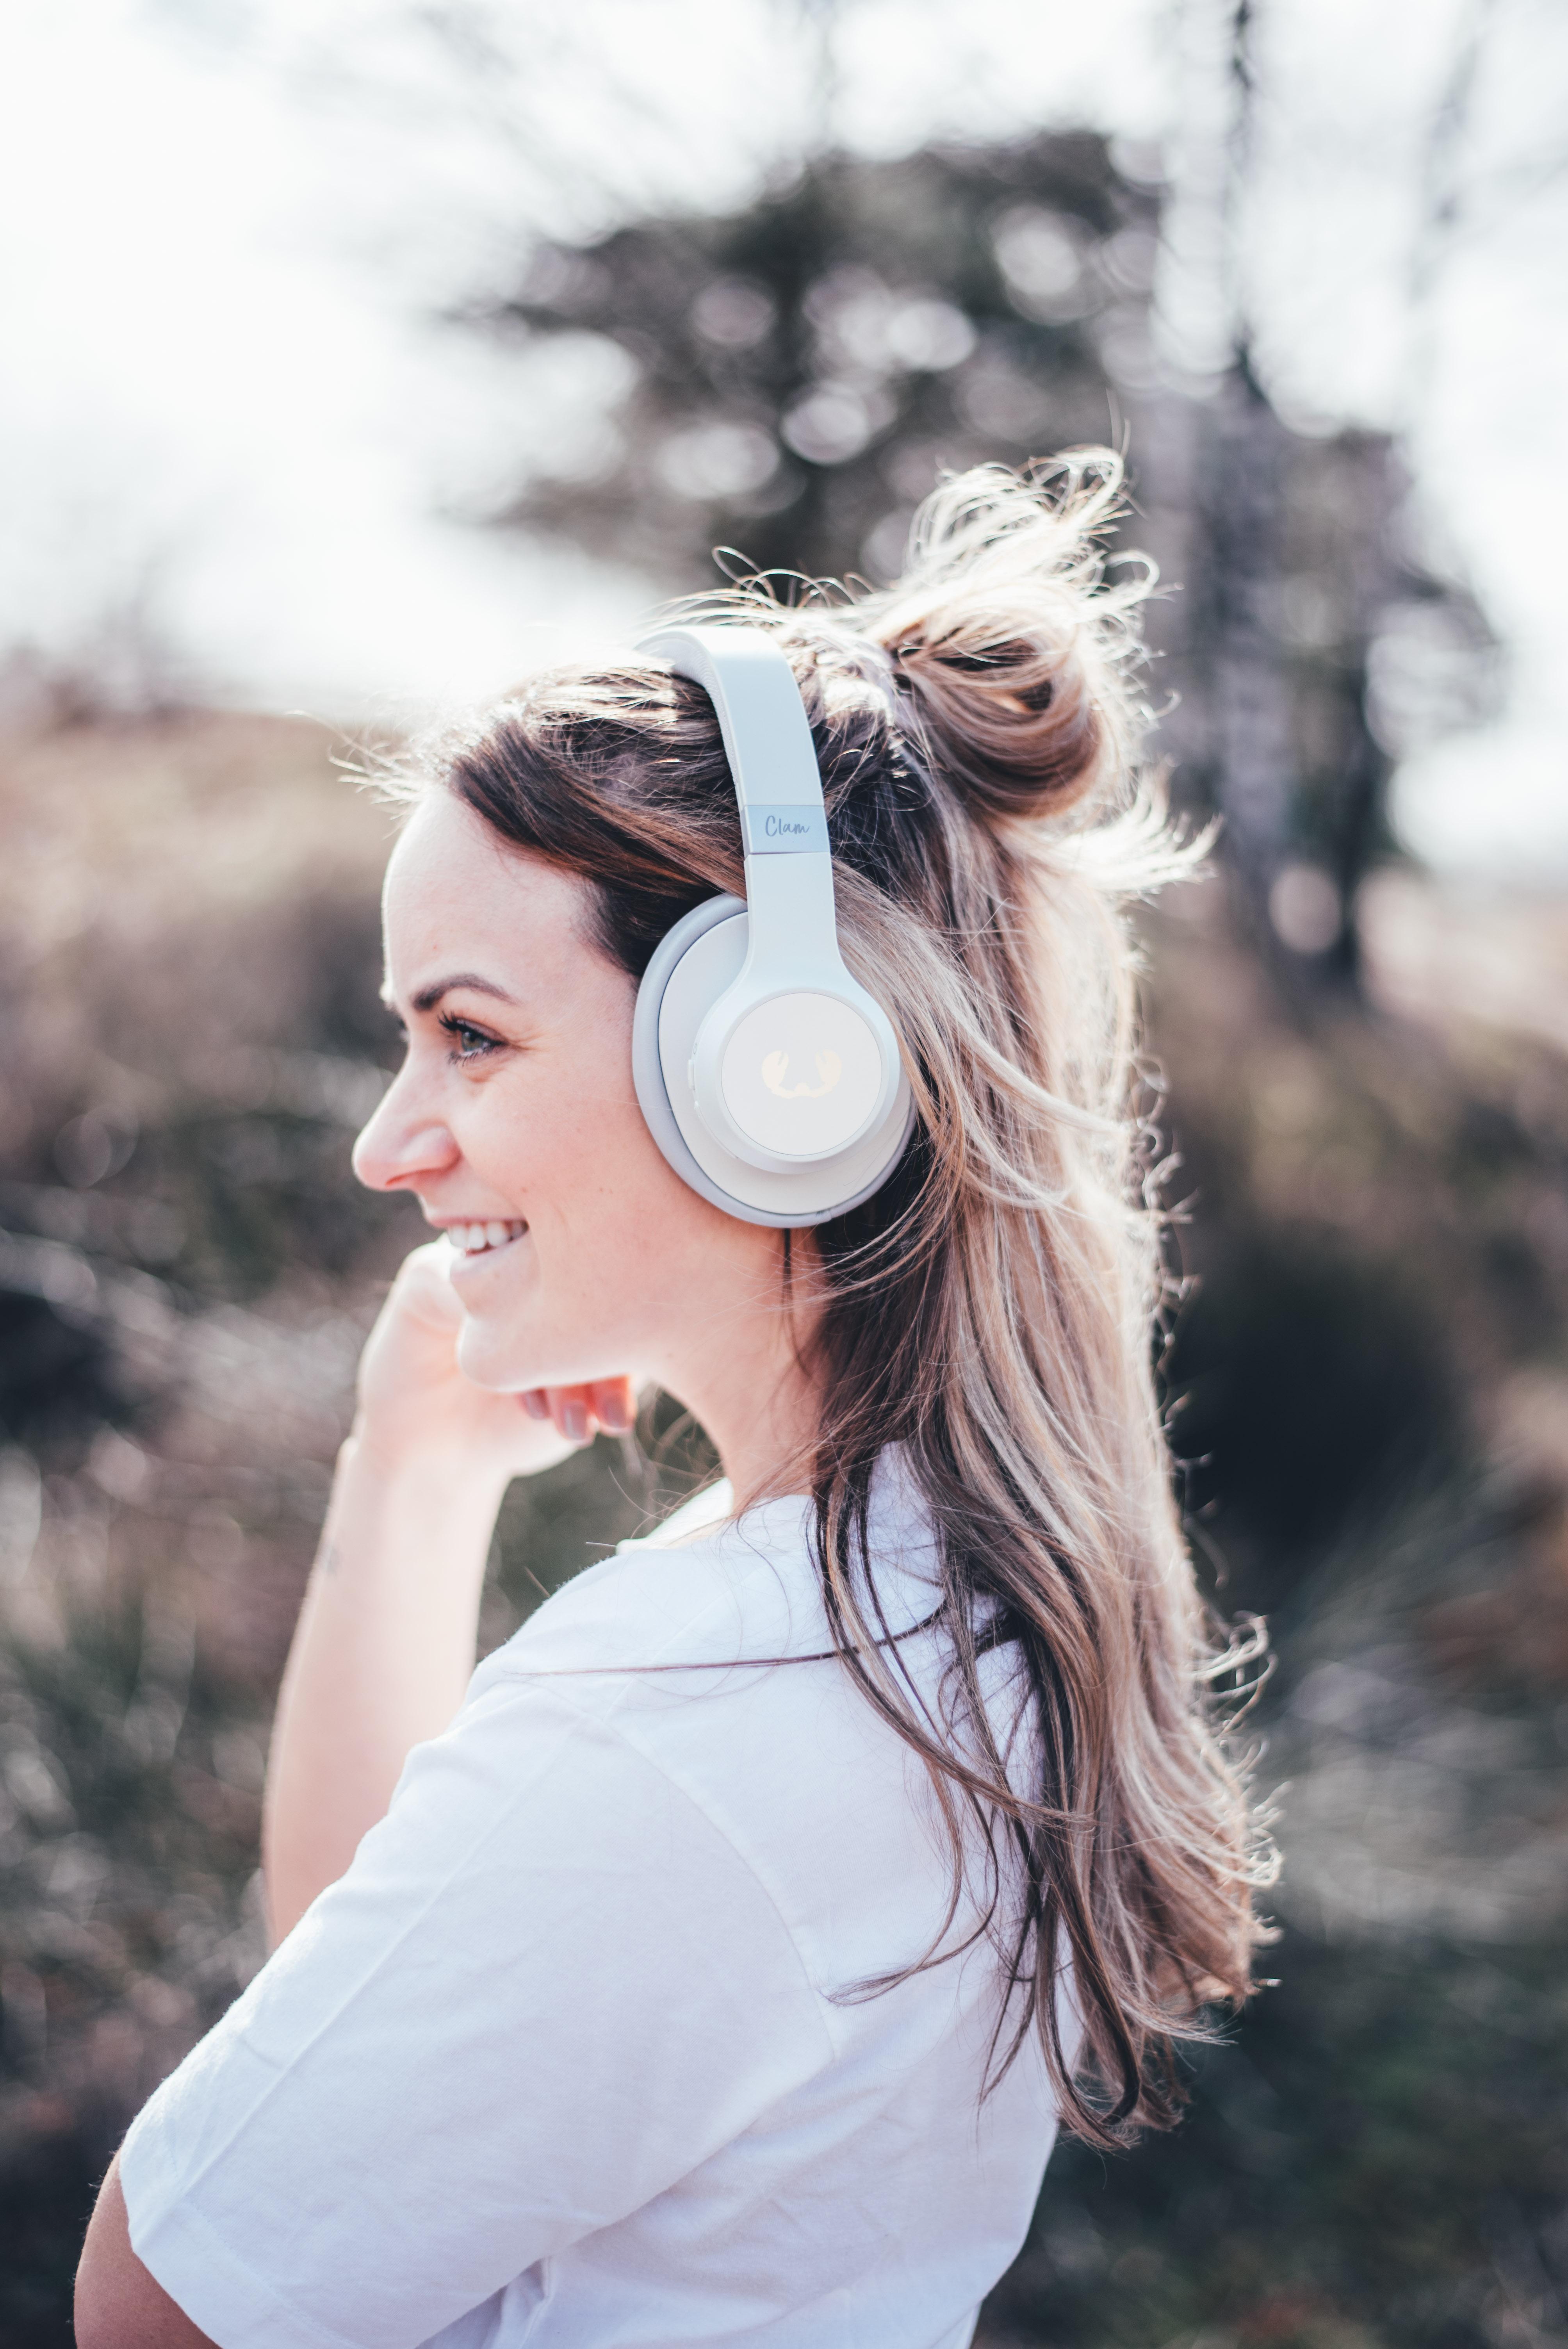 fresh n rebel, headphone, koptelefoon, muziek, muziekluisteren, freshnrebel, famousstore, famous store, socialeras, sport, sportlegging, legging